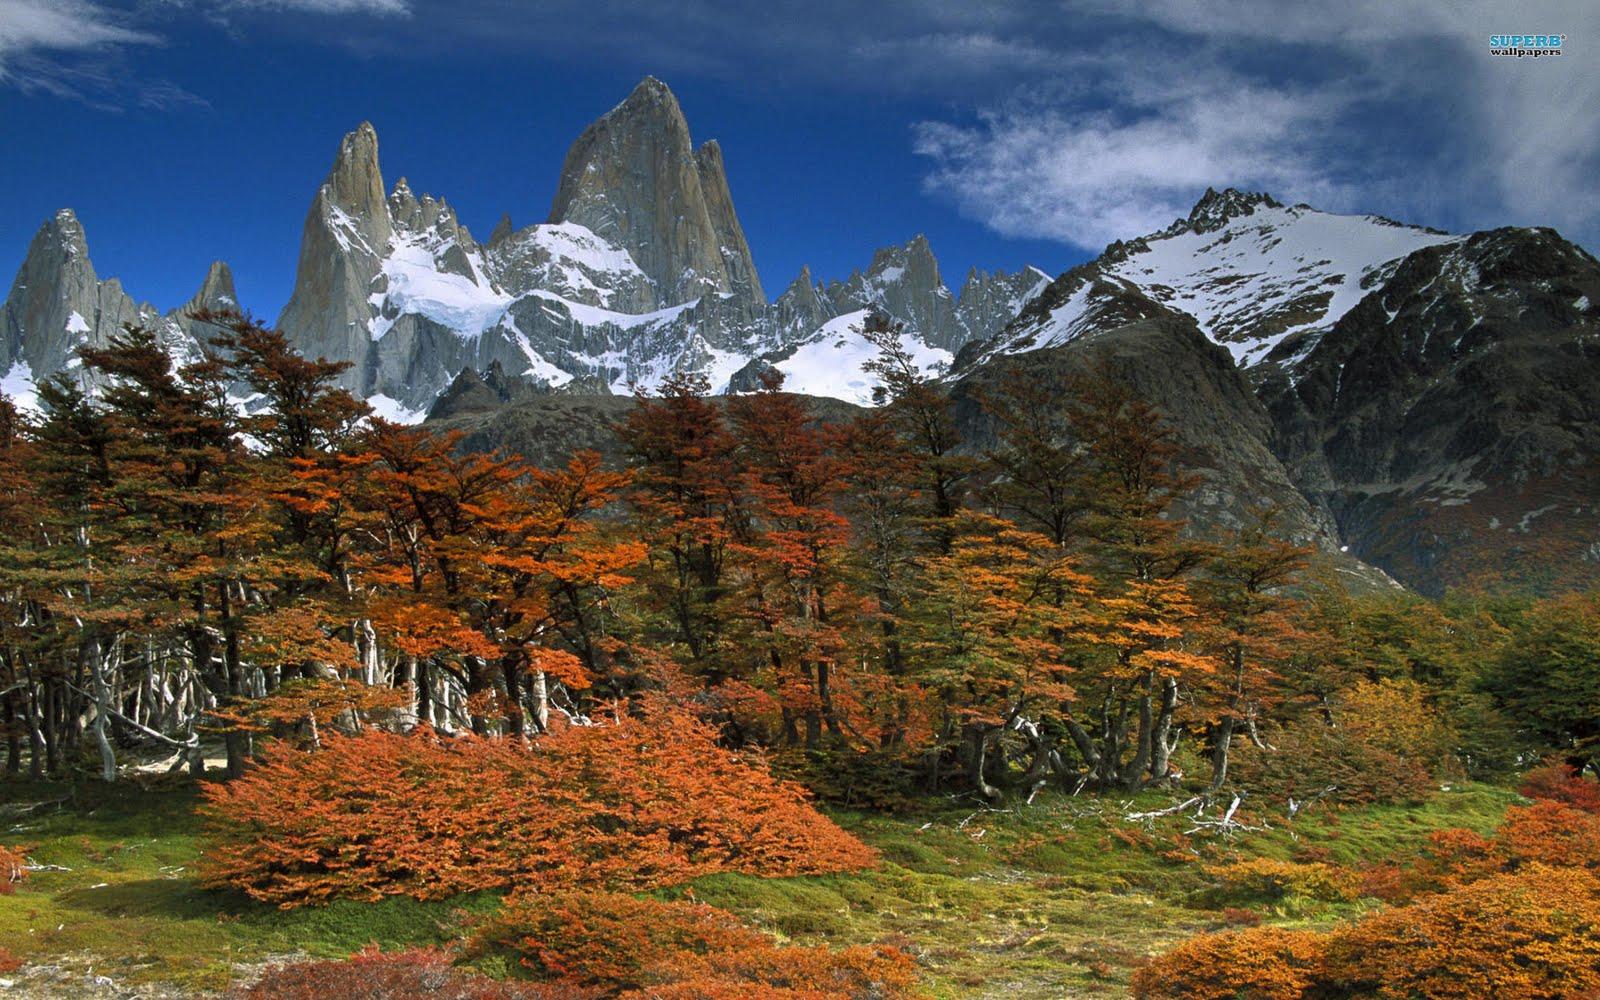 http://1.bp.blogspot.com/-fqIBPp4Vmhw/TcwU2hngUgI/AAAAAAAANPI/C_goMW5WunM/s1600/mount-fitzroy-los-glaciares-national-park-1146-1920x1200.jpg